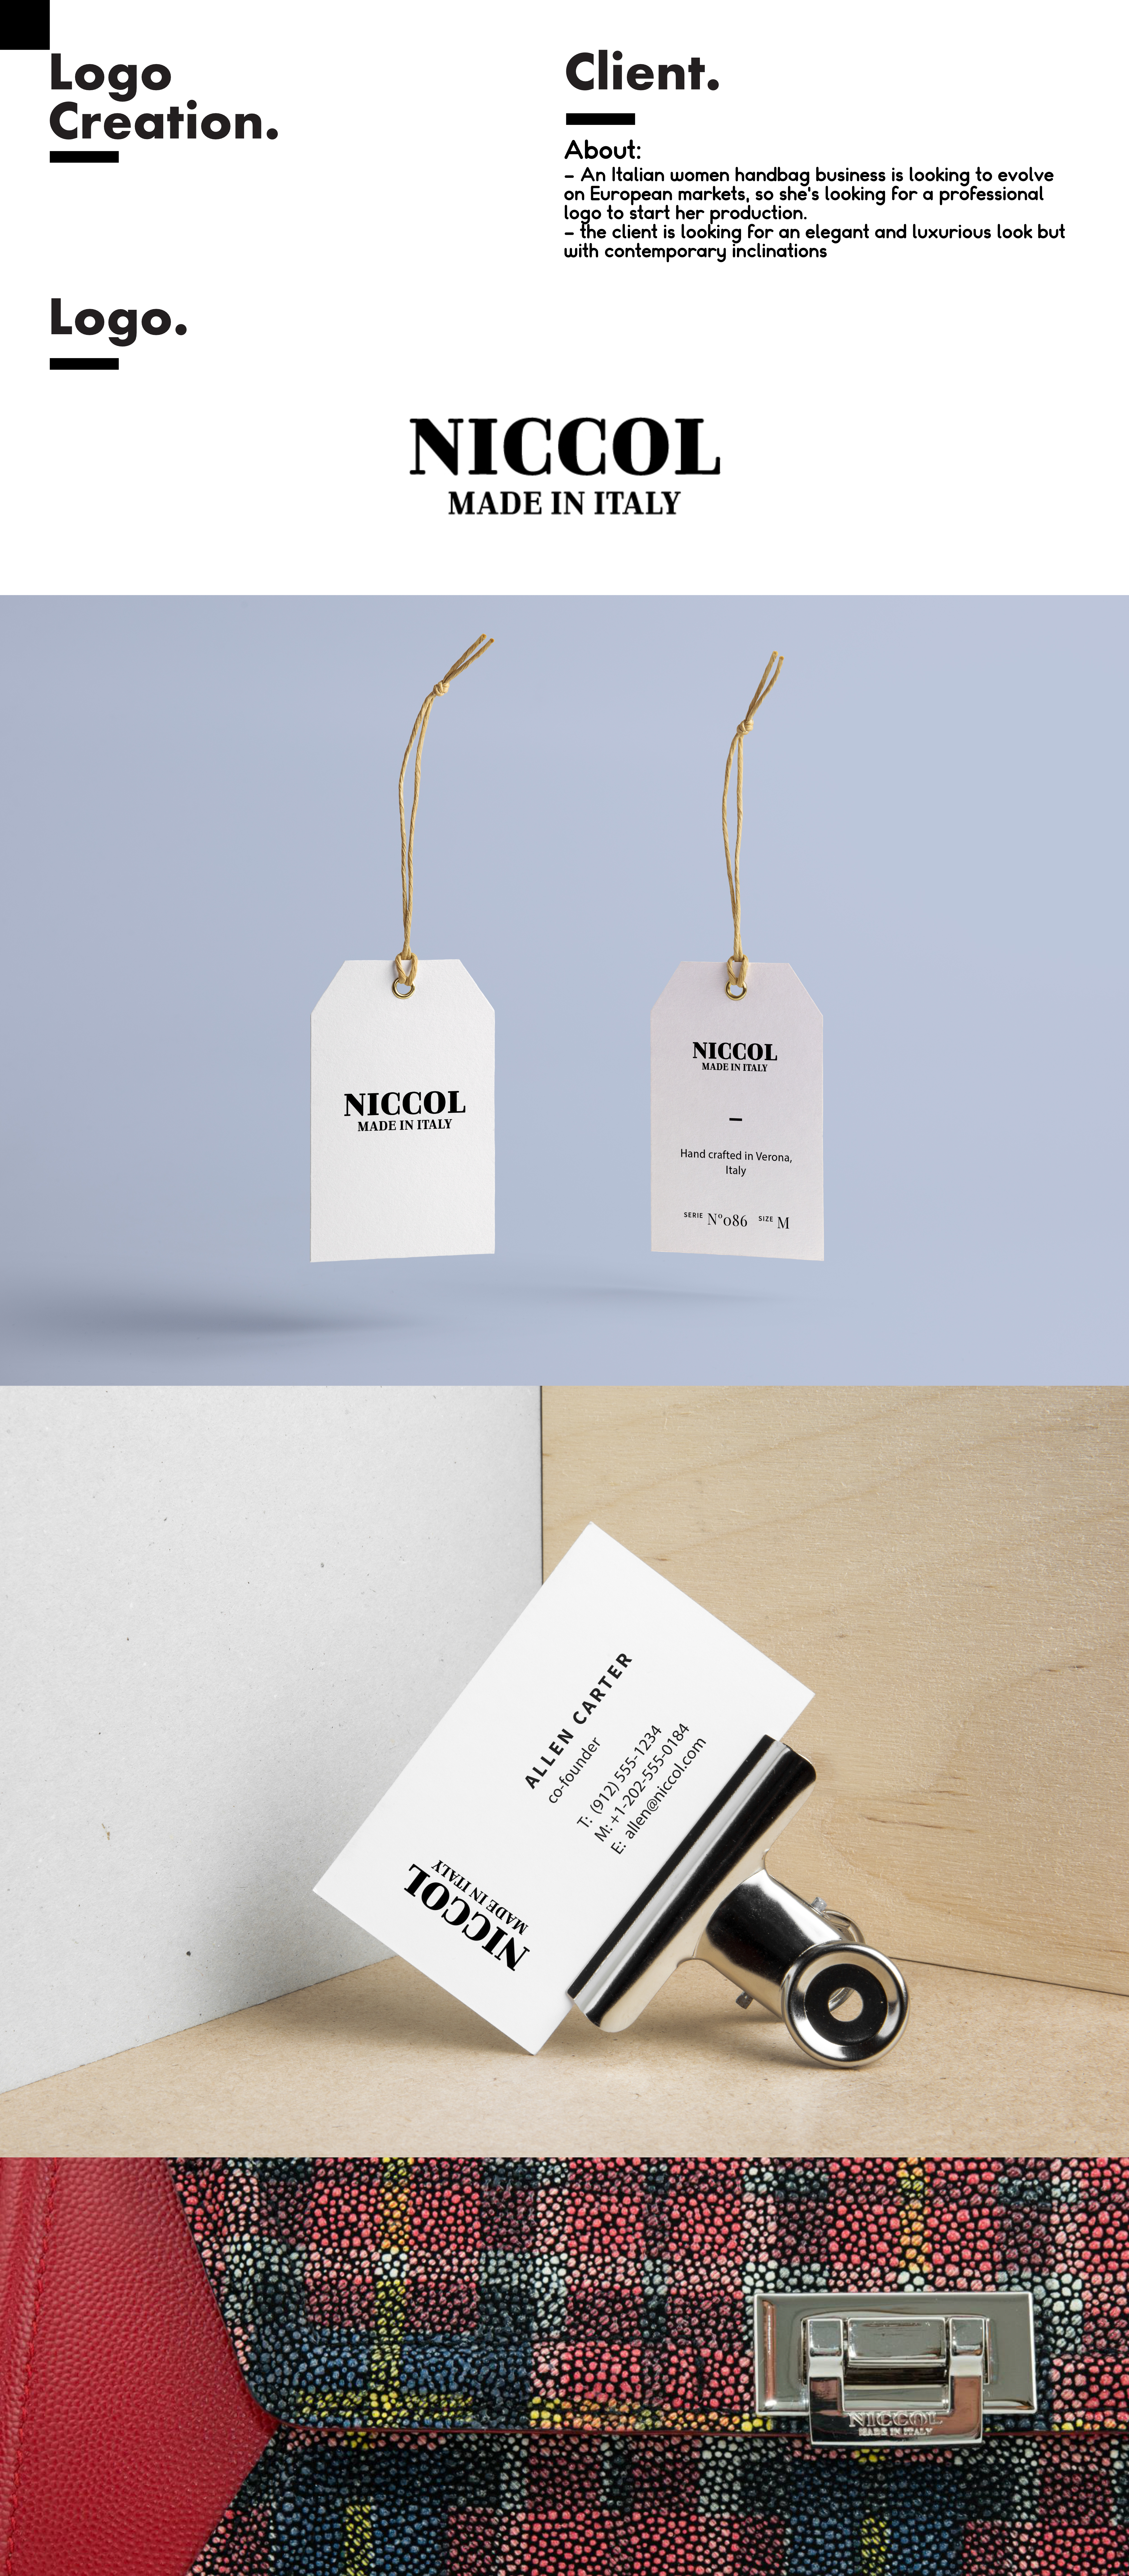 niccol_branding_guidelines